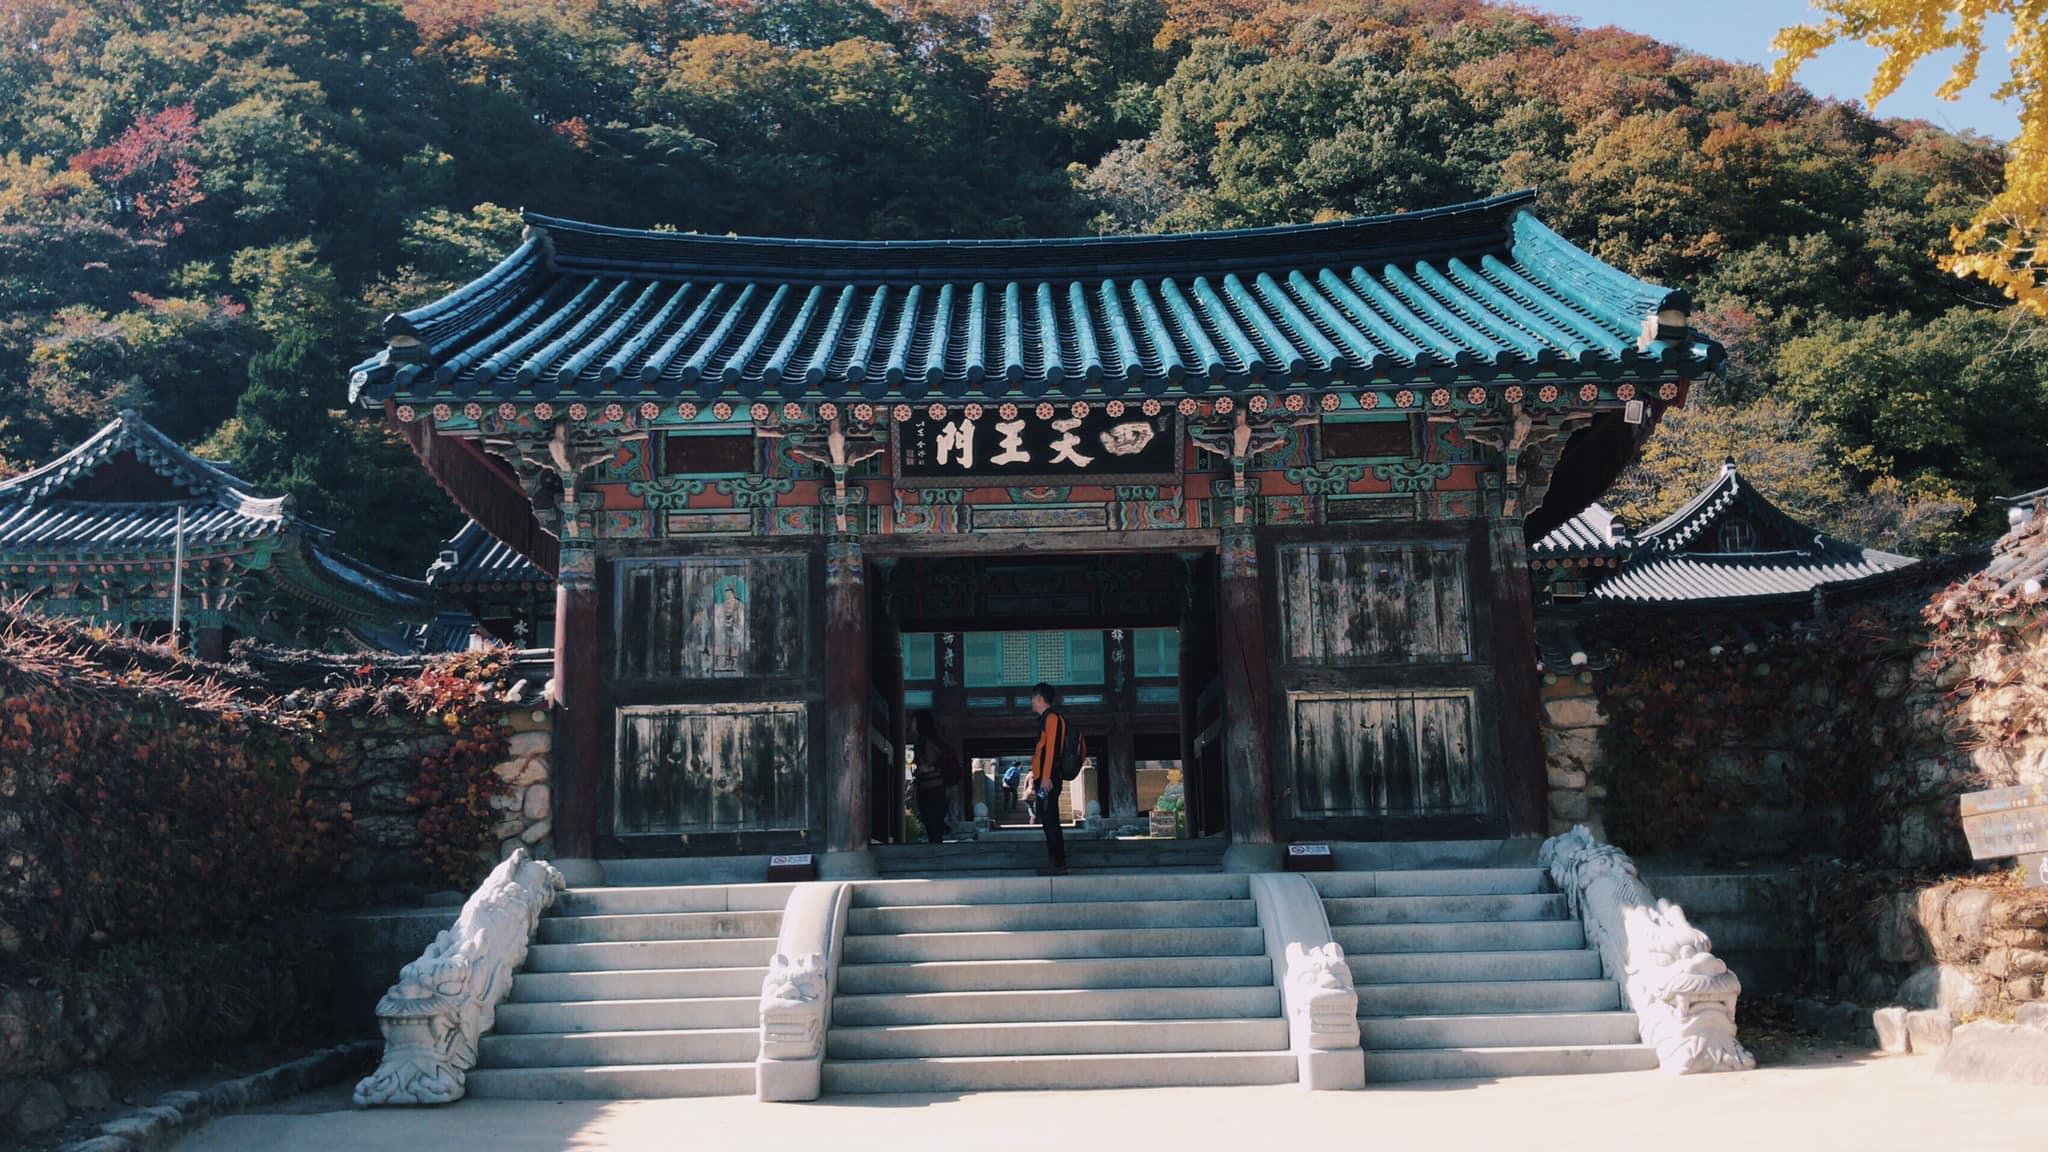 cổng đền tại vườn quốc gia seoraksan